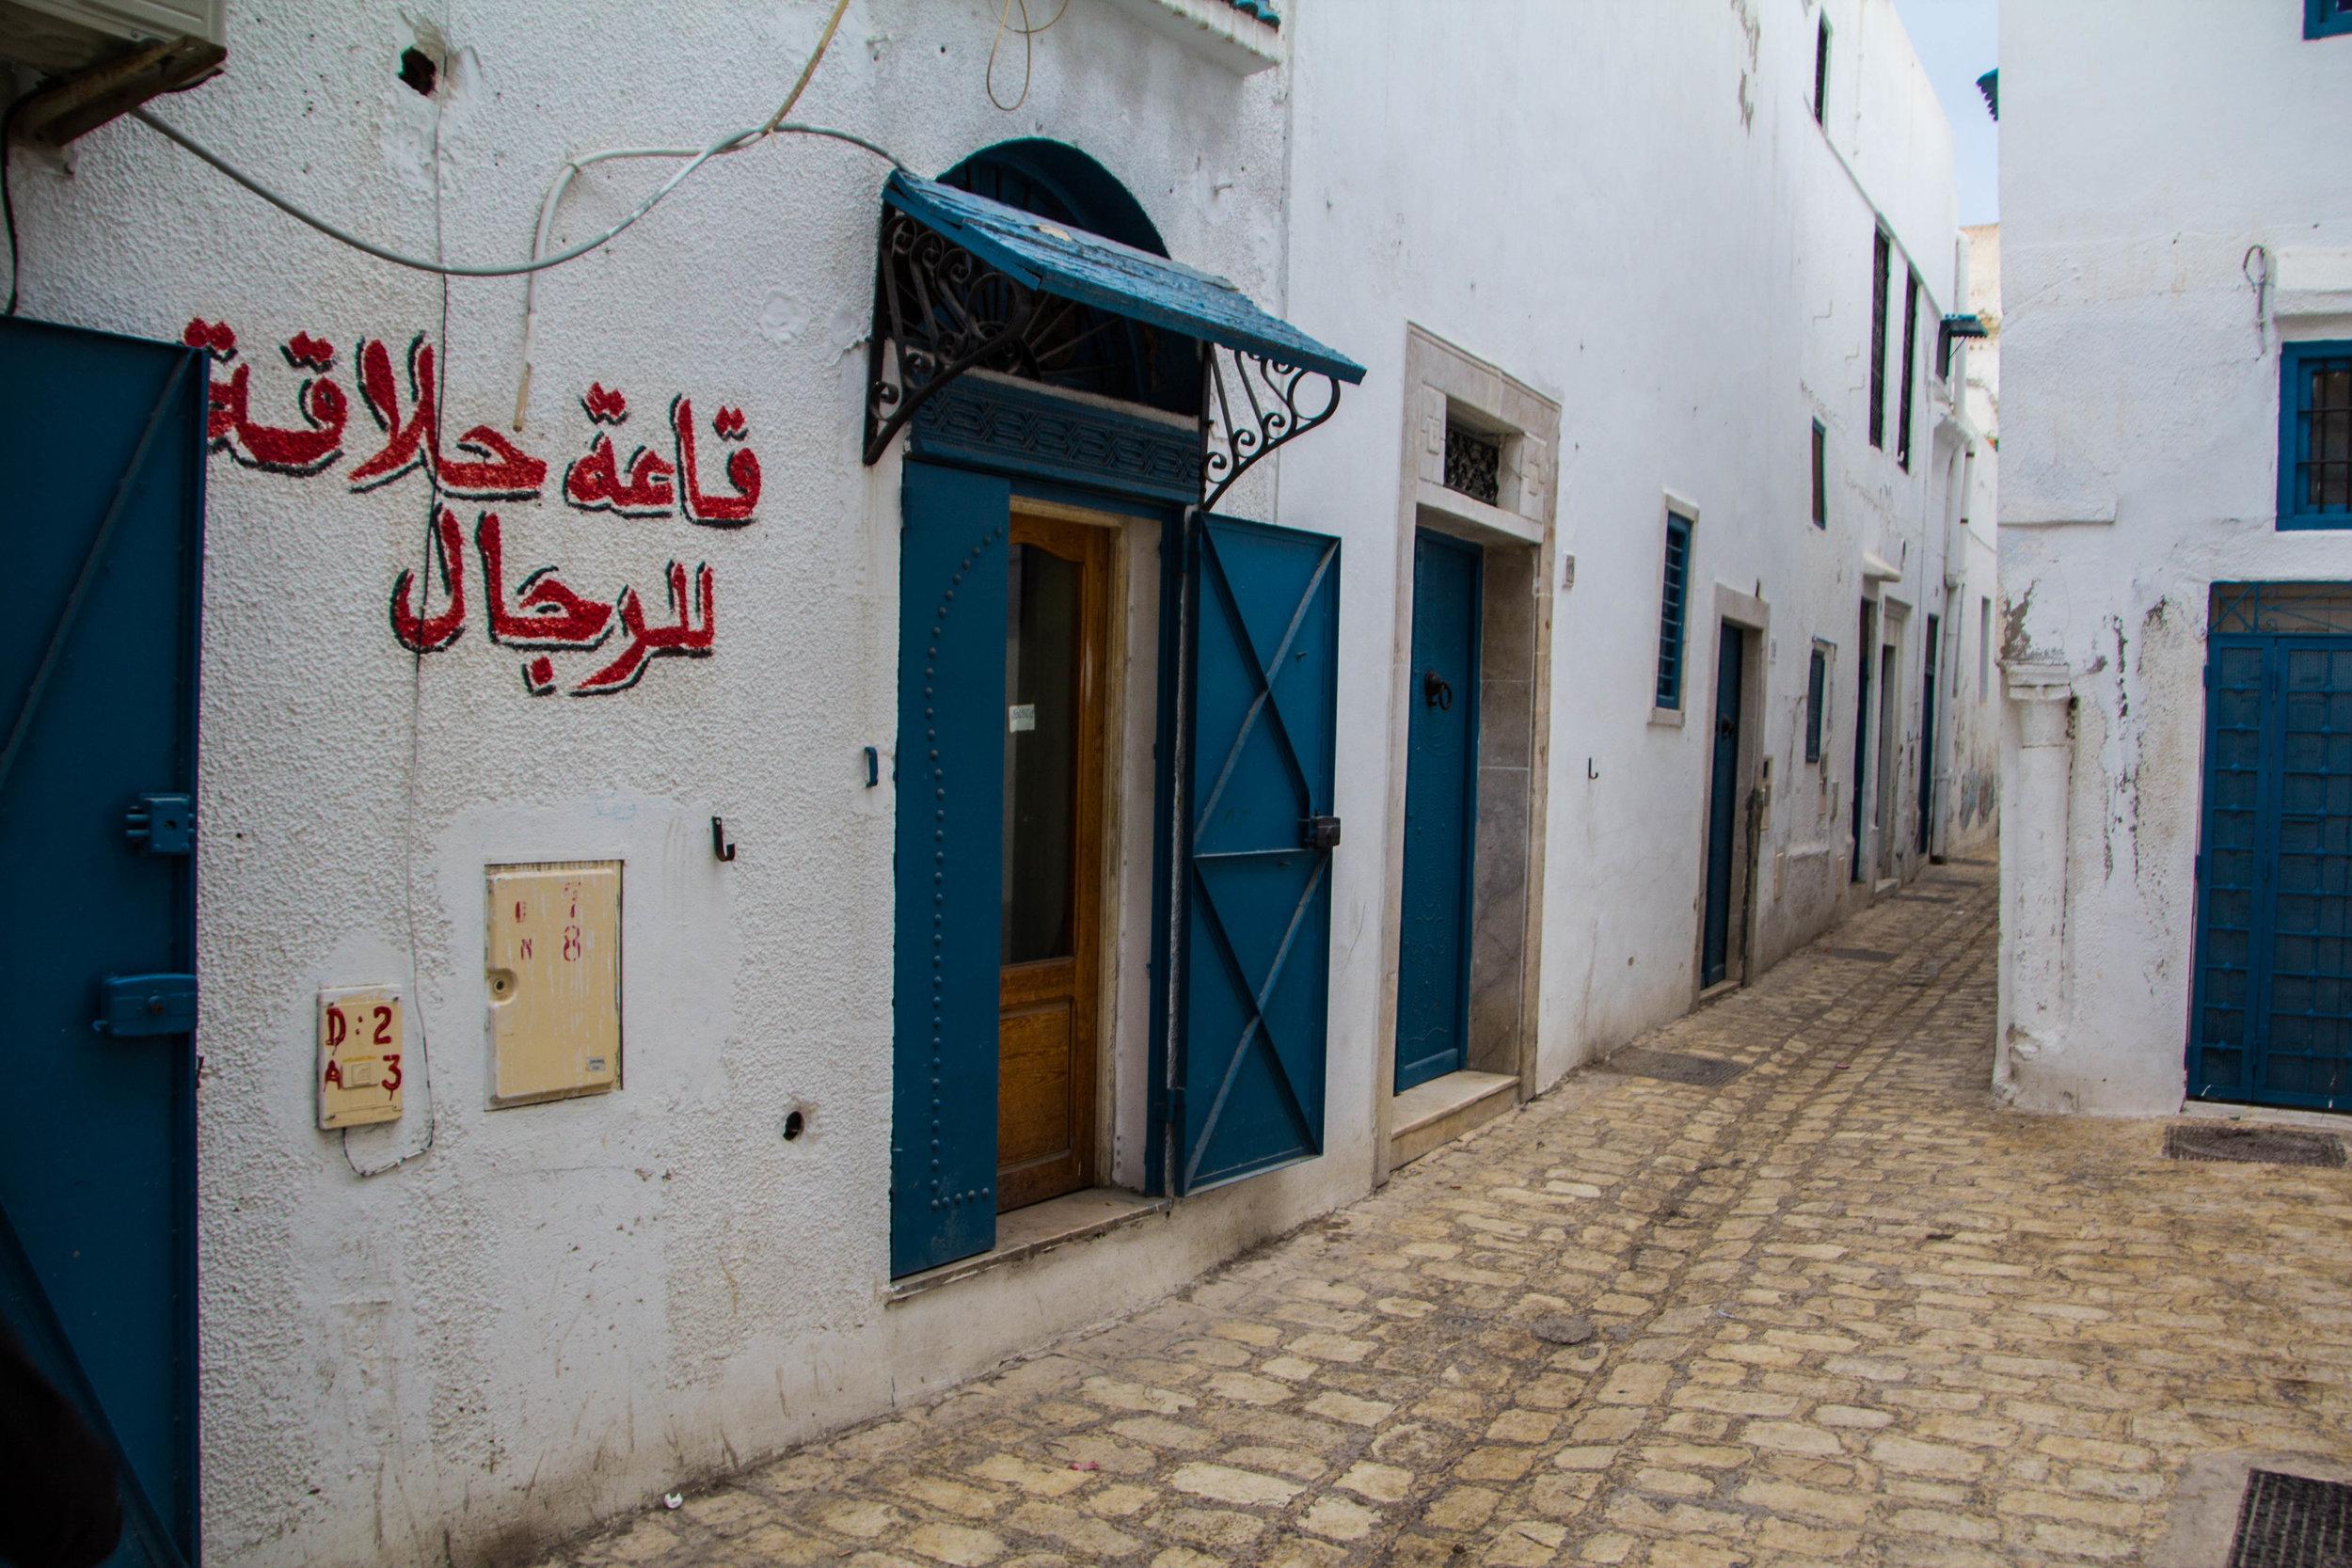 medina-photography-tunis-tunisia-46.jpg